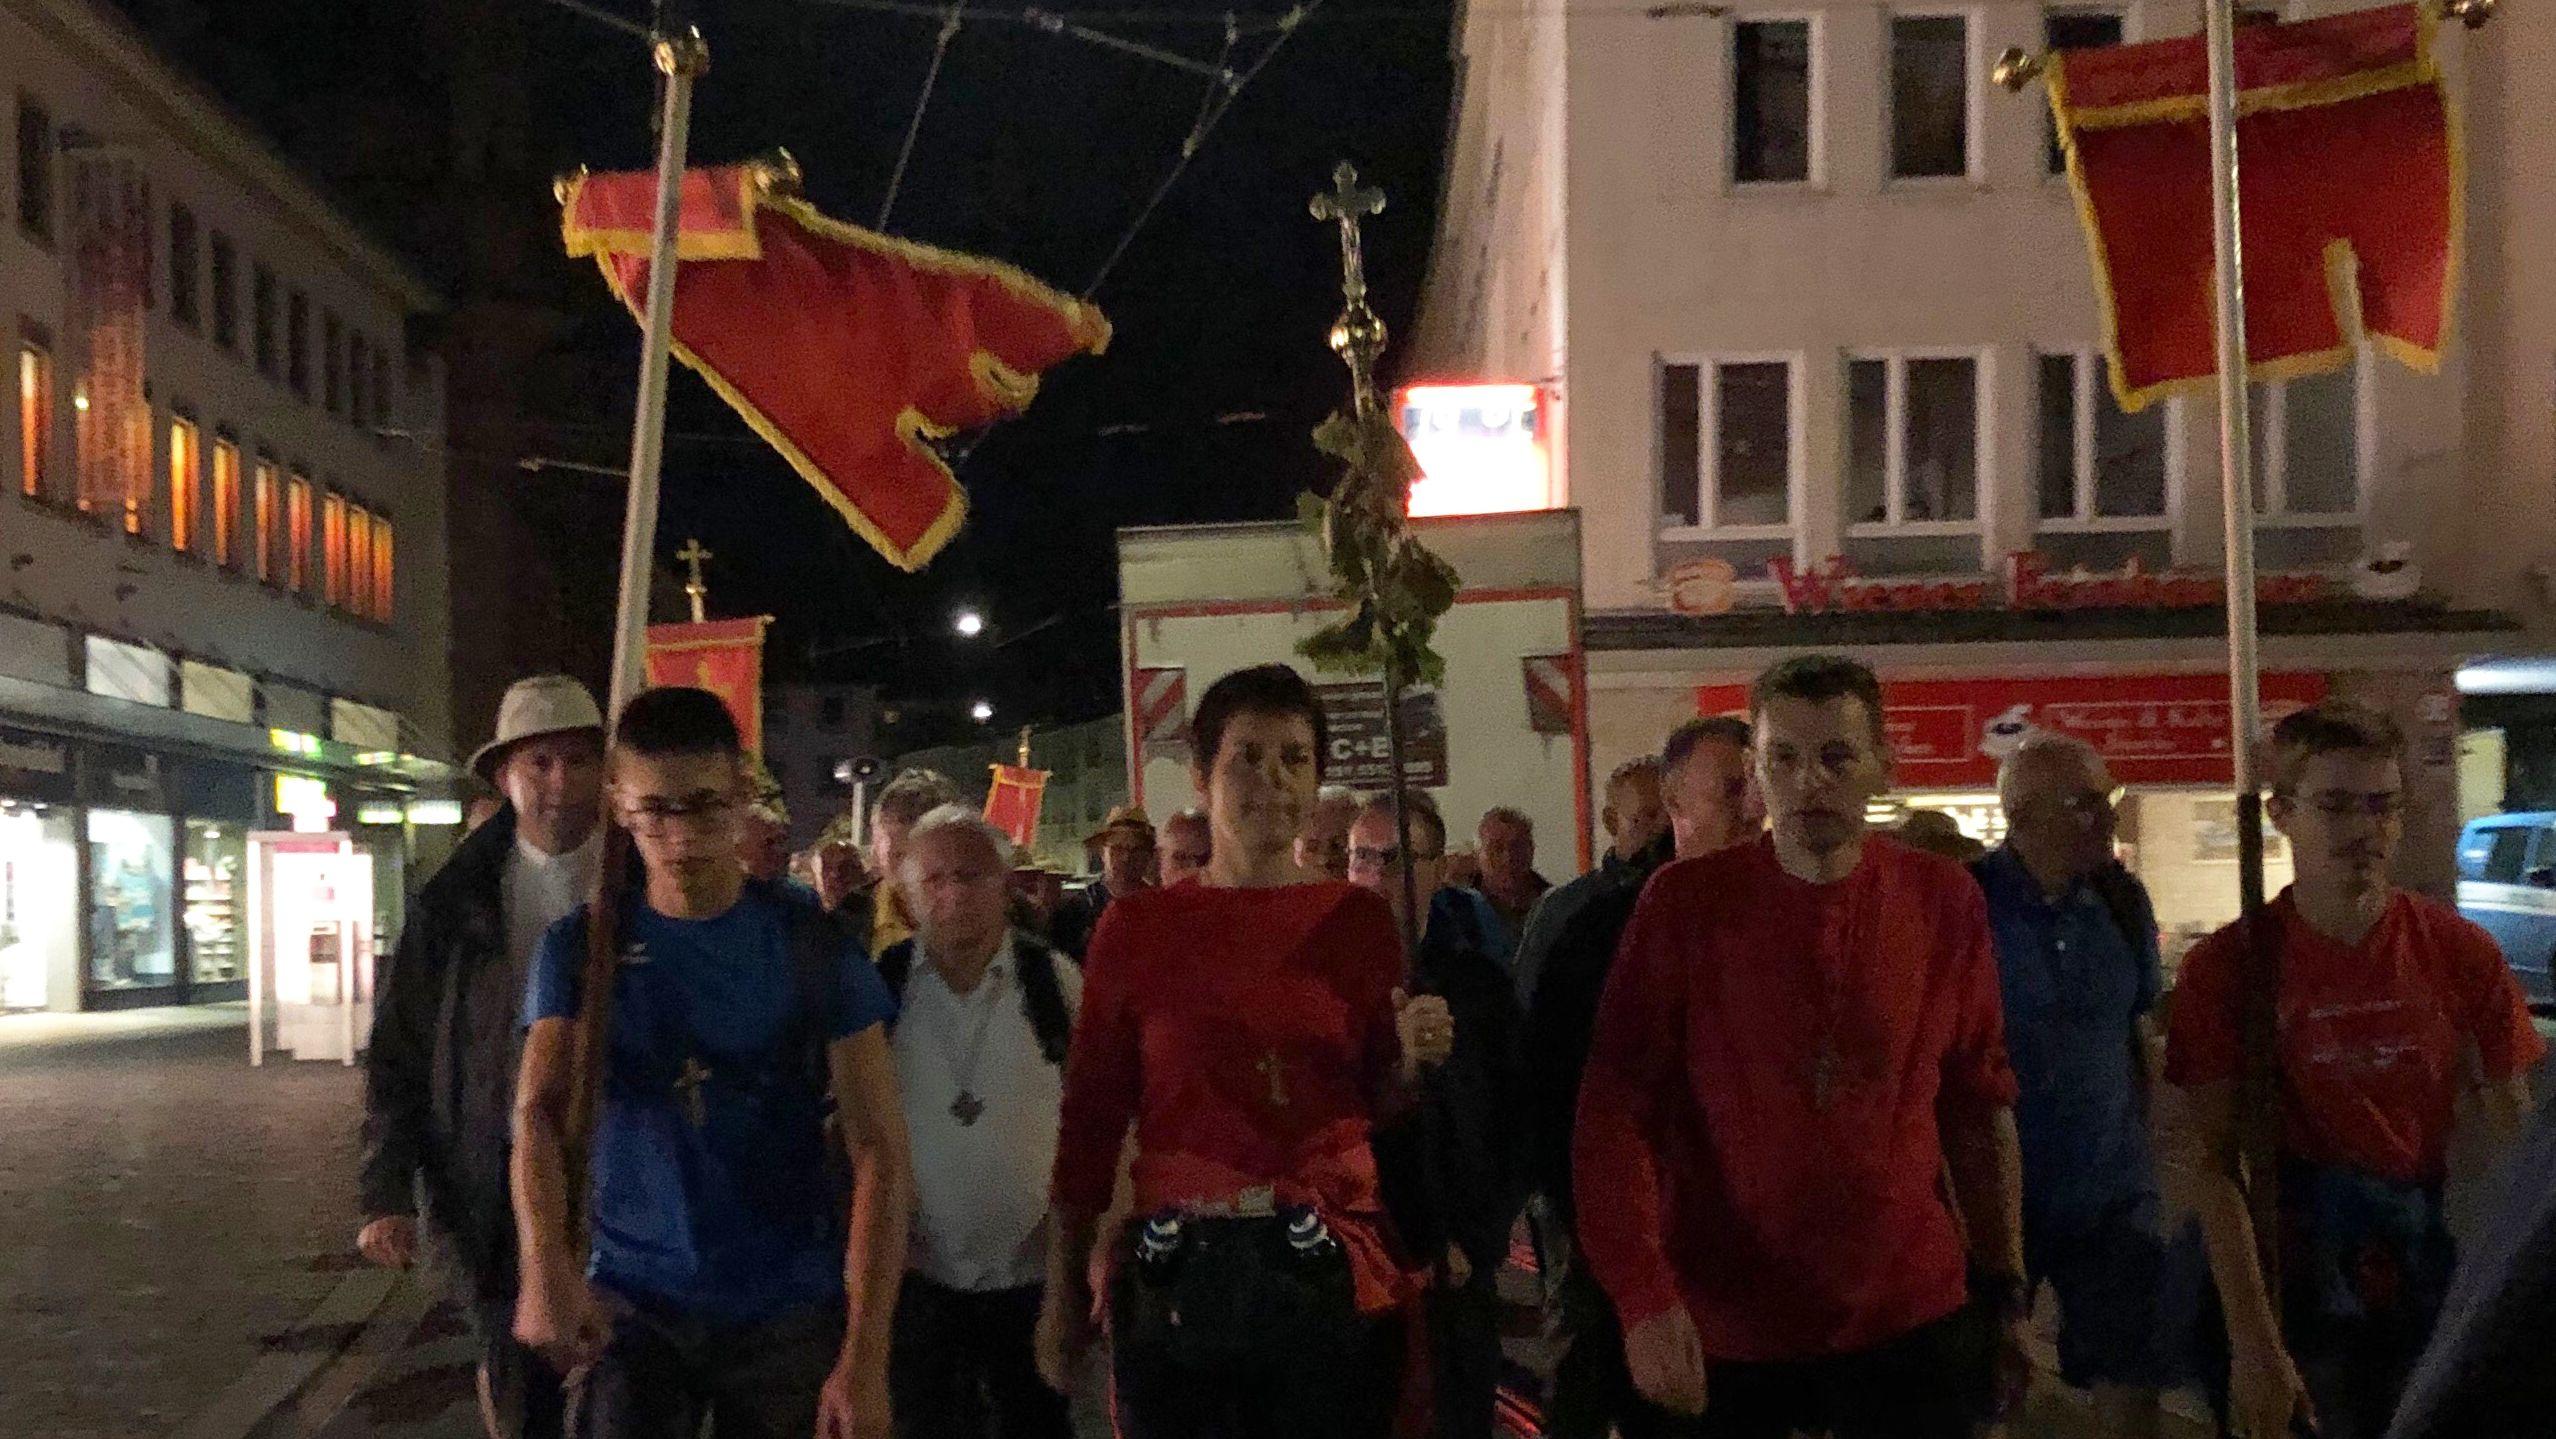 Kreuzbergwallfahrer